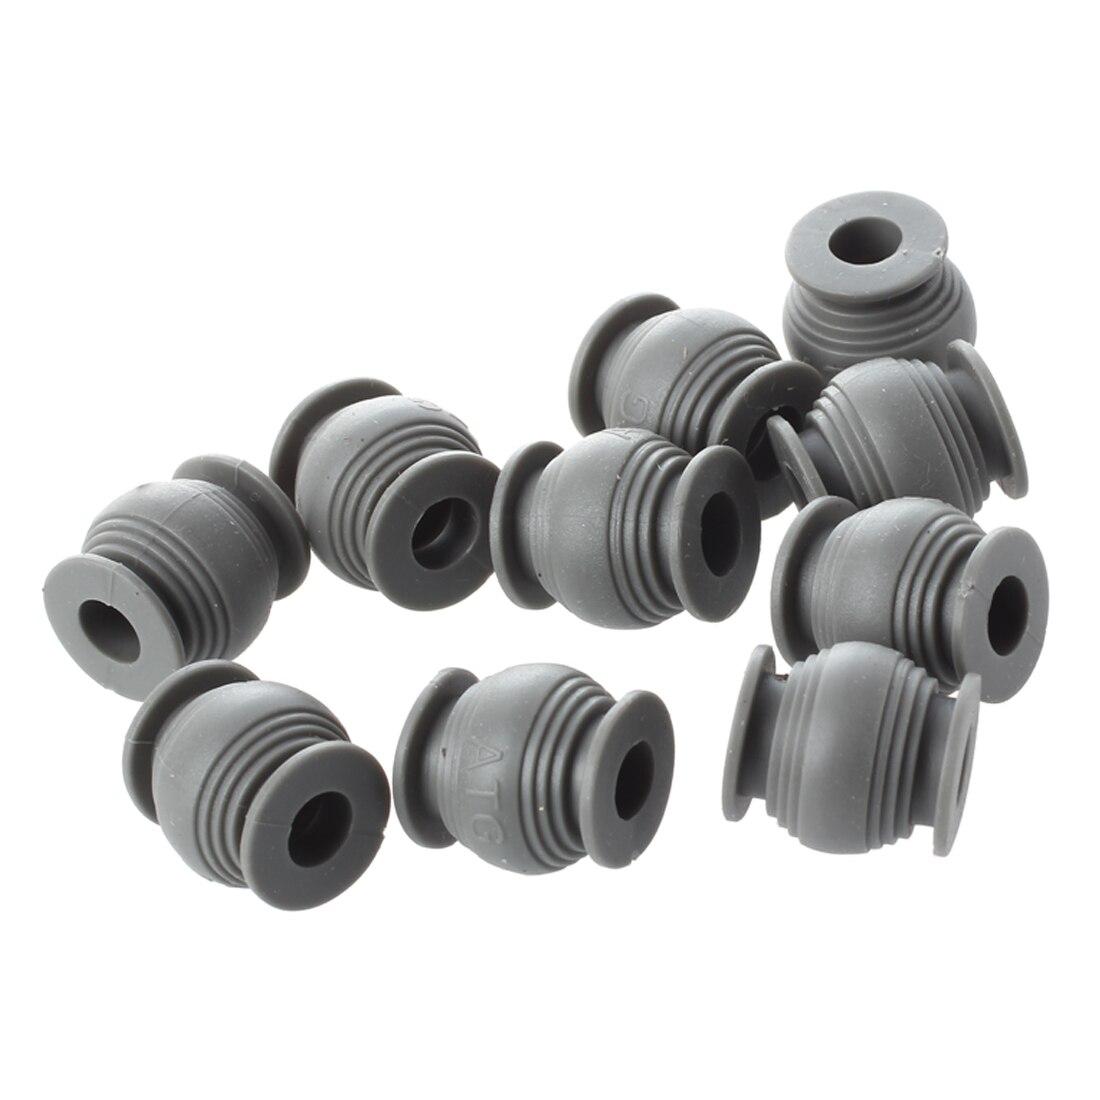 Hearty 10x Atg Av Anti Vibration Ball High Elastic Rubber Dual-head Grey 120 G Choice Materials